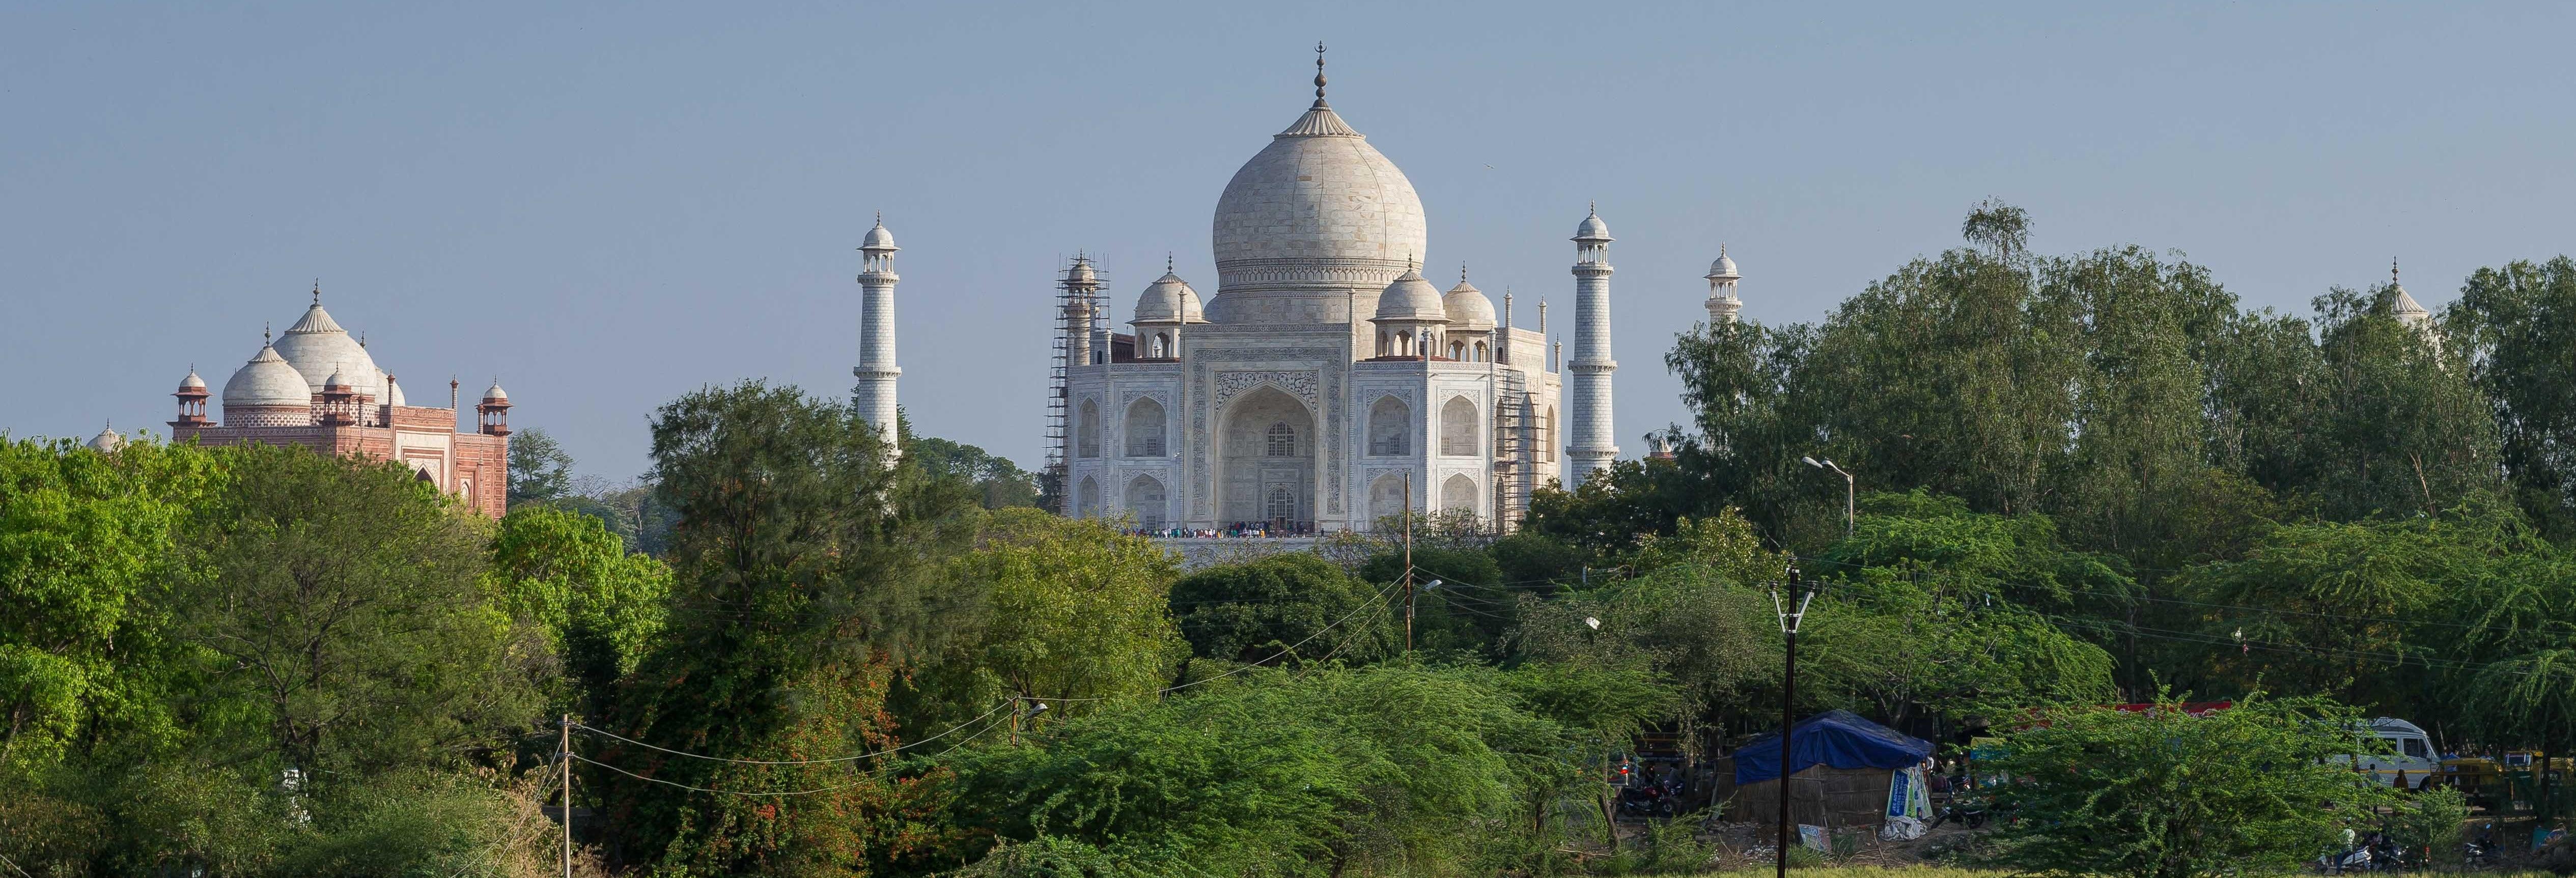 Visite privée d'Agra à vélo